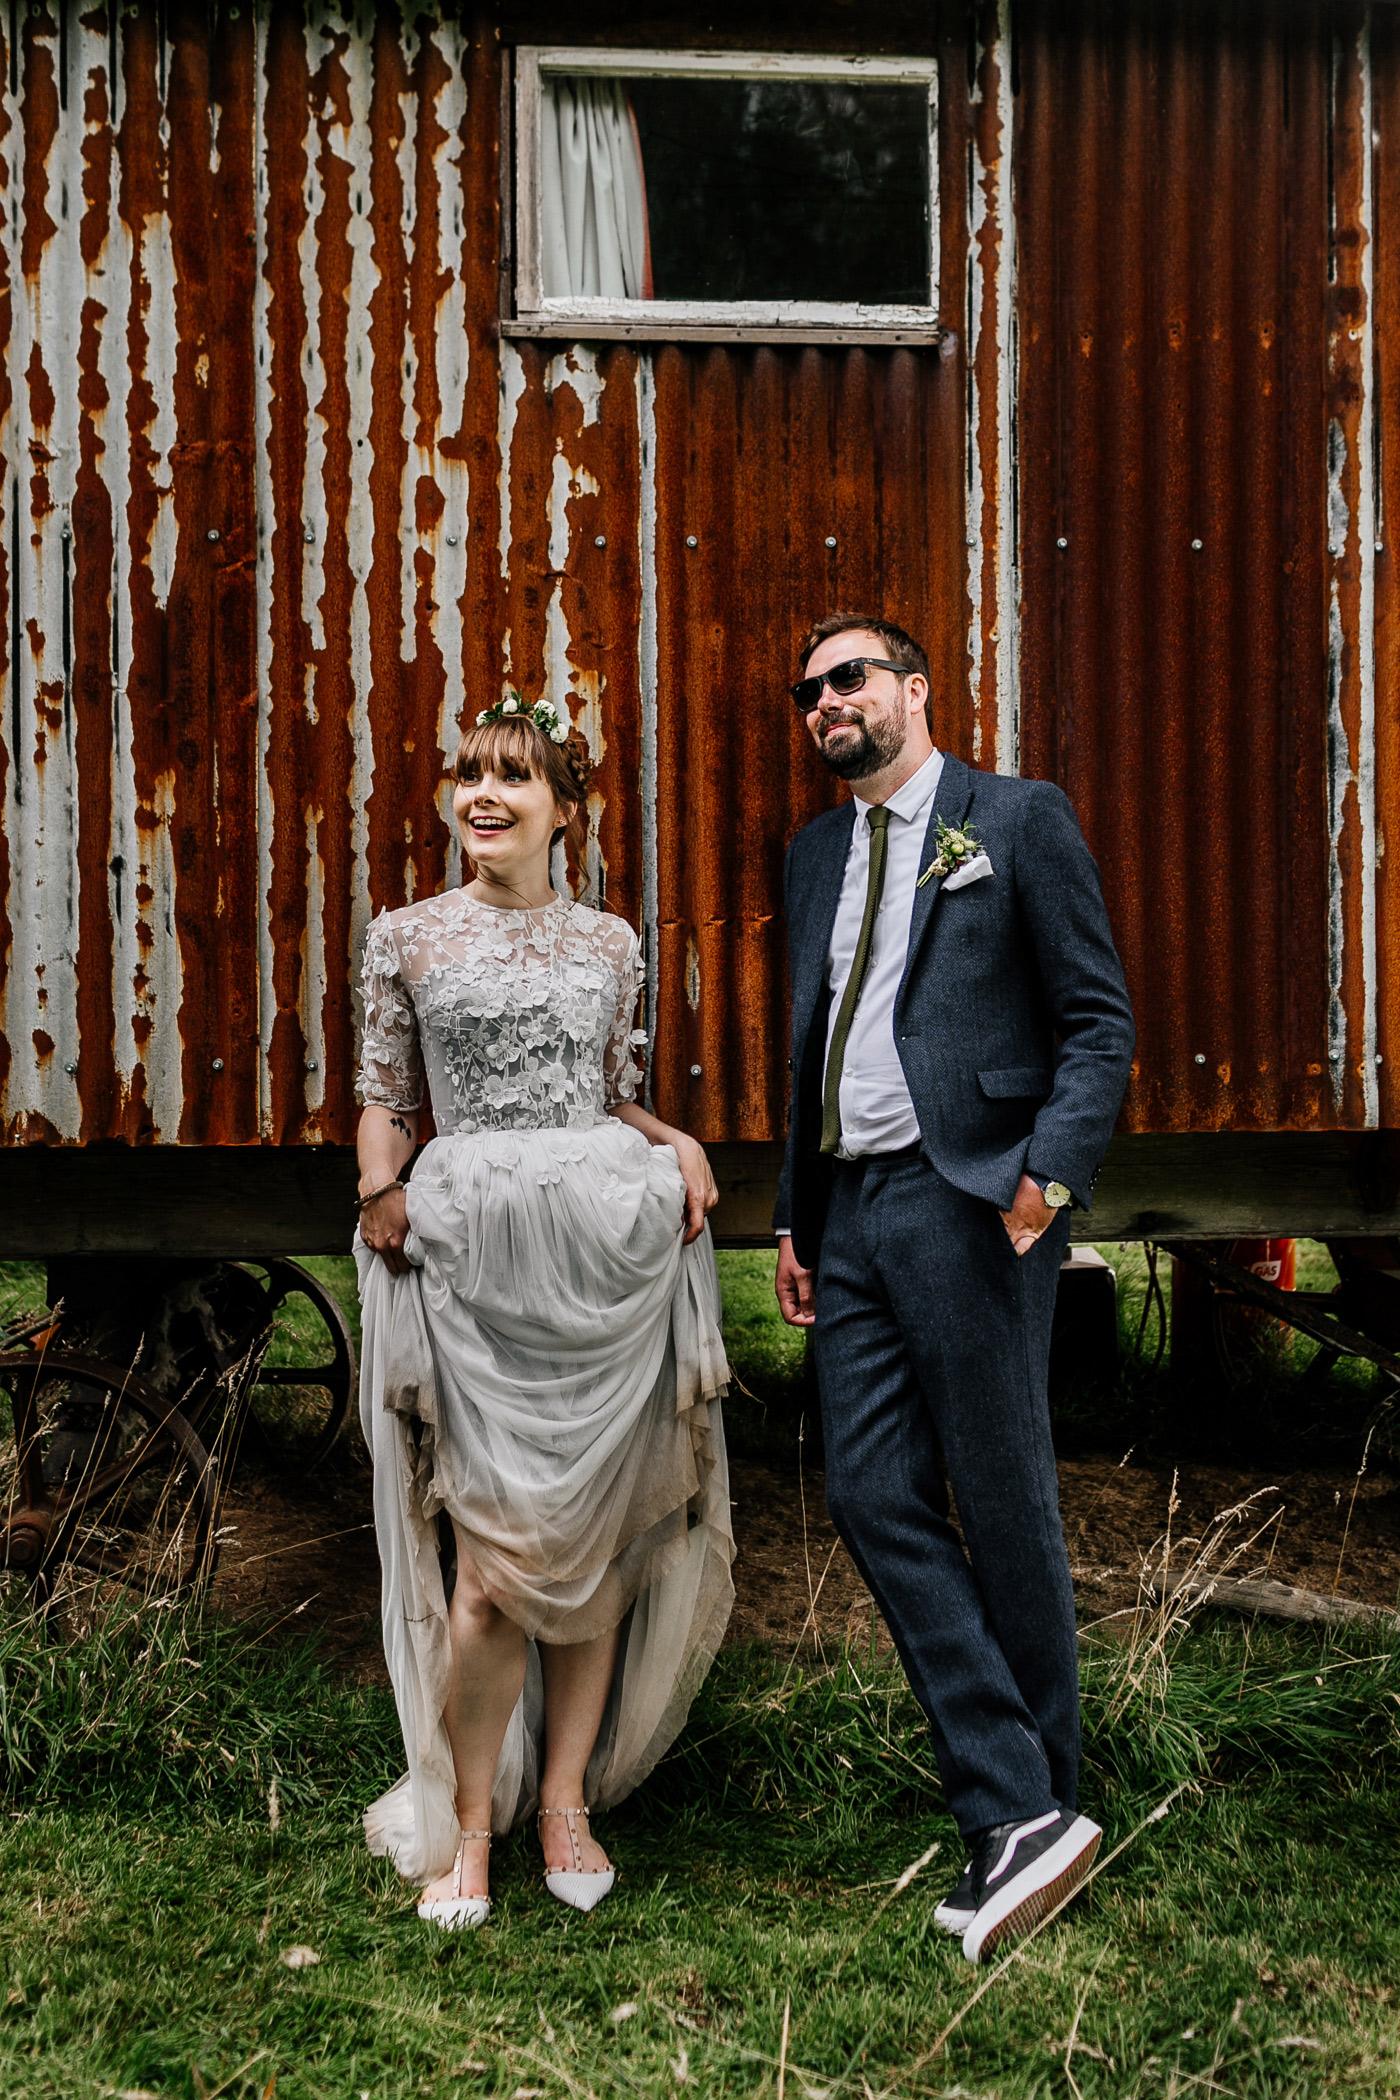 KENT-wedding-photographer-Epic-Love-Story-054.jpg